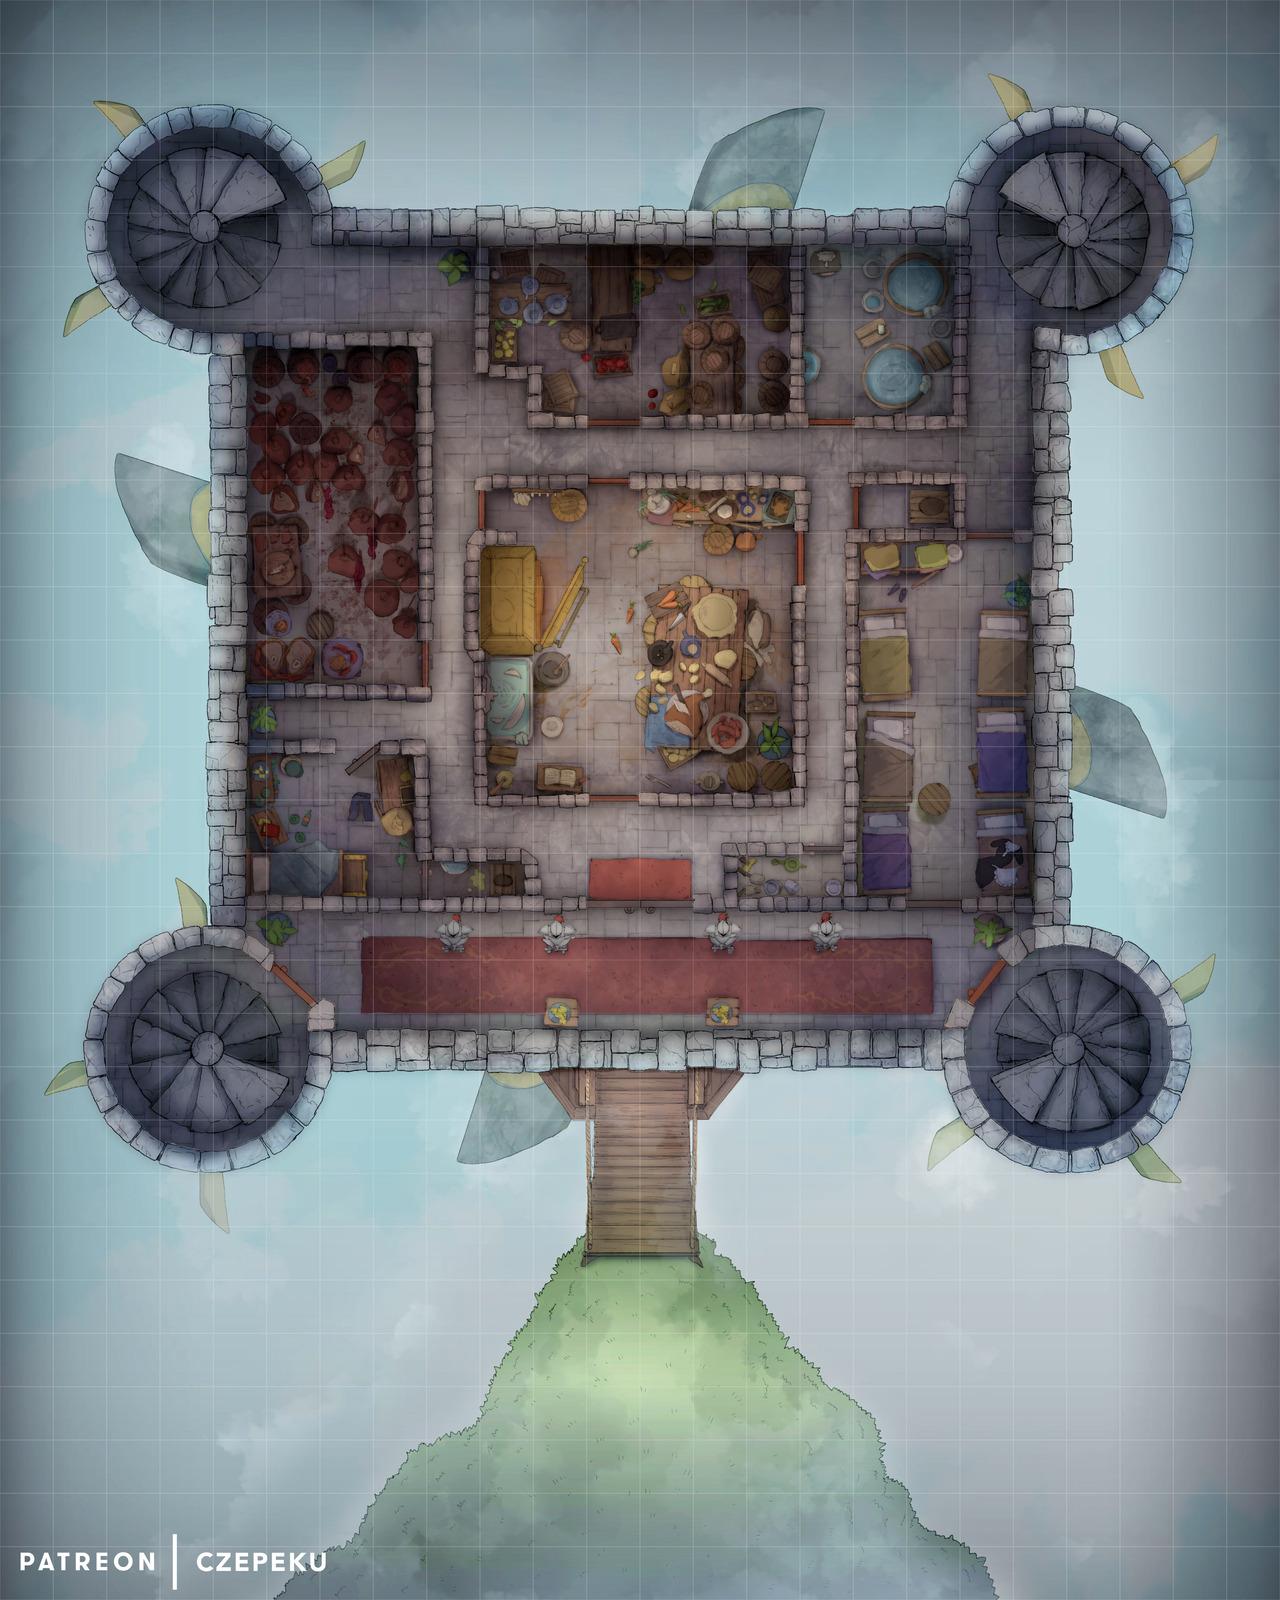 Dnd Castle Map : castle, Czepeku's, Flying, Castle, Battlemap!, For...